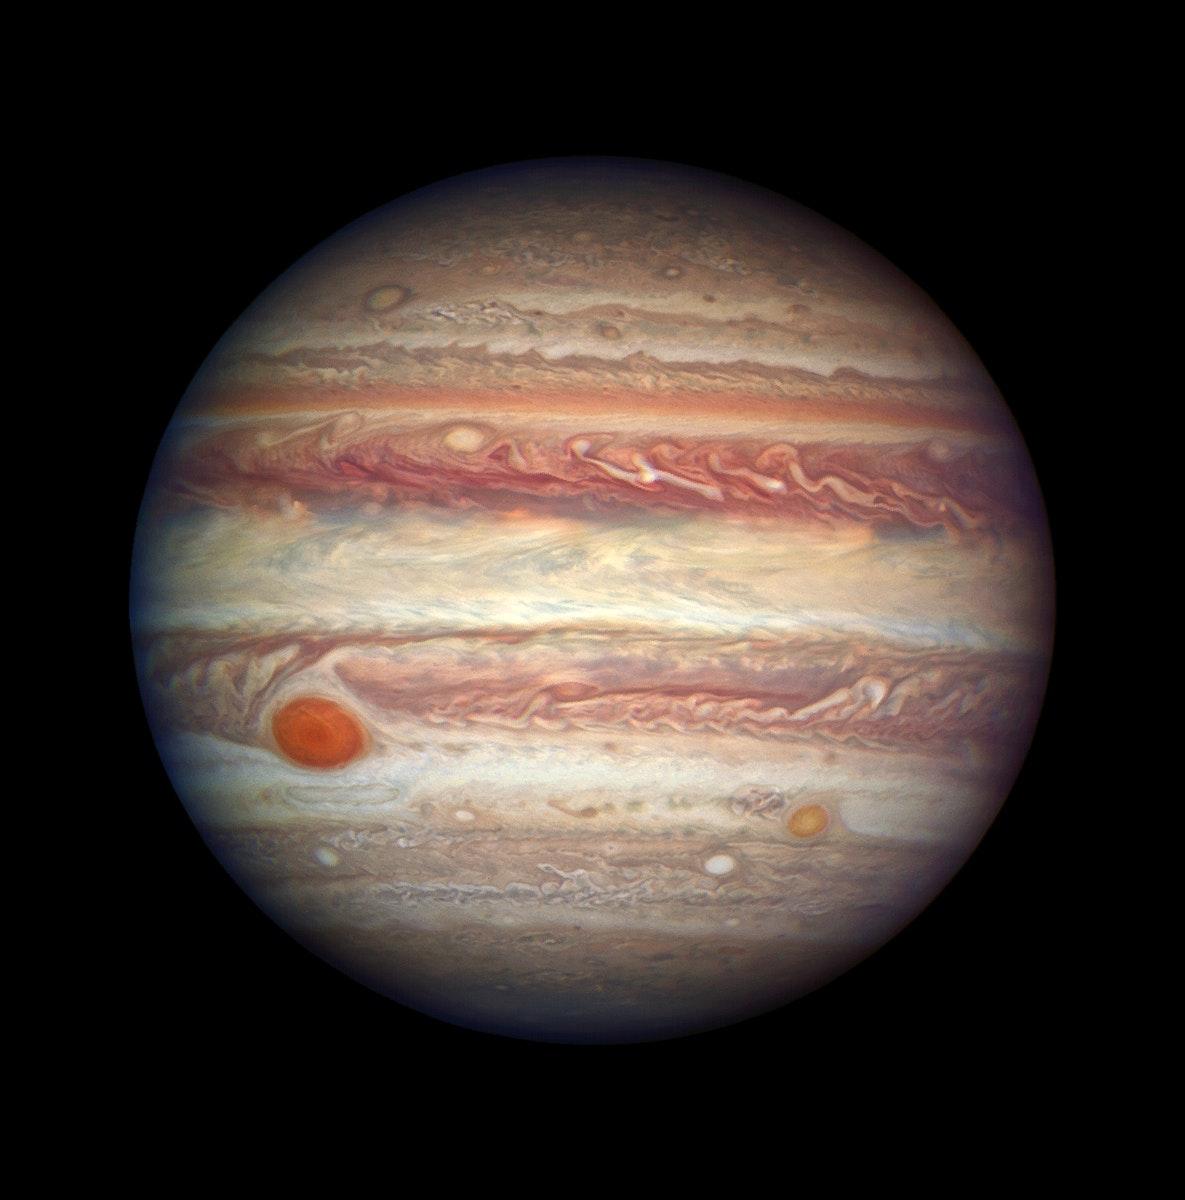 NASA's Hubble Takes Close-up Portrait of Jupiter on April 3, 2017. Original from NASA. Digitally enhanced by rawpixel.